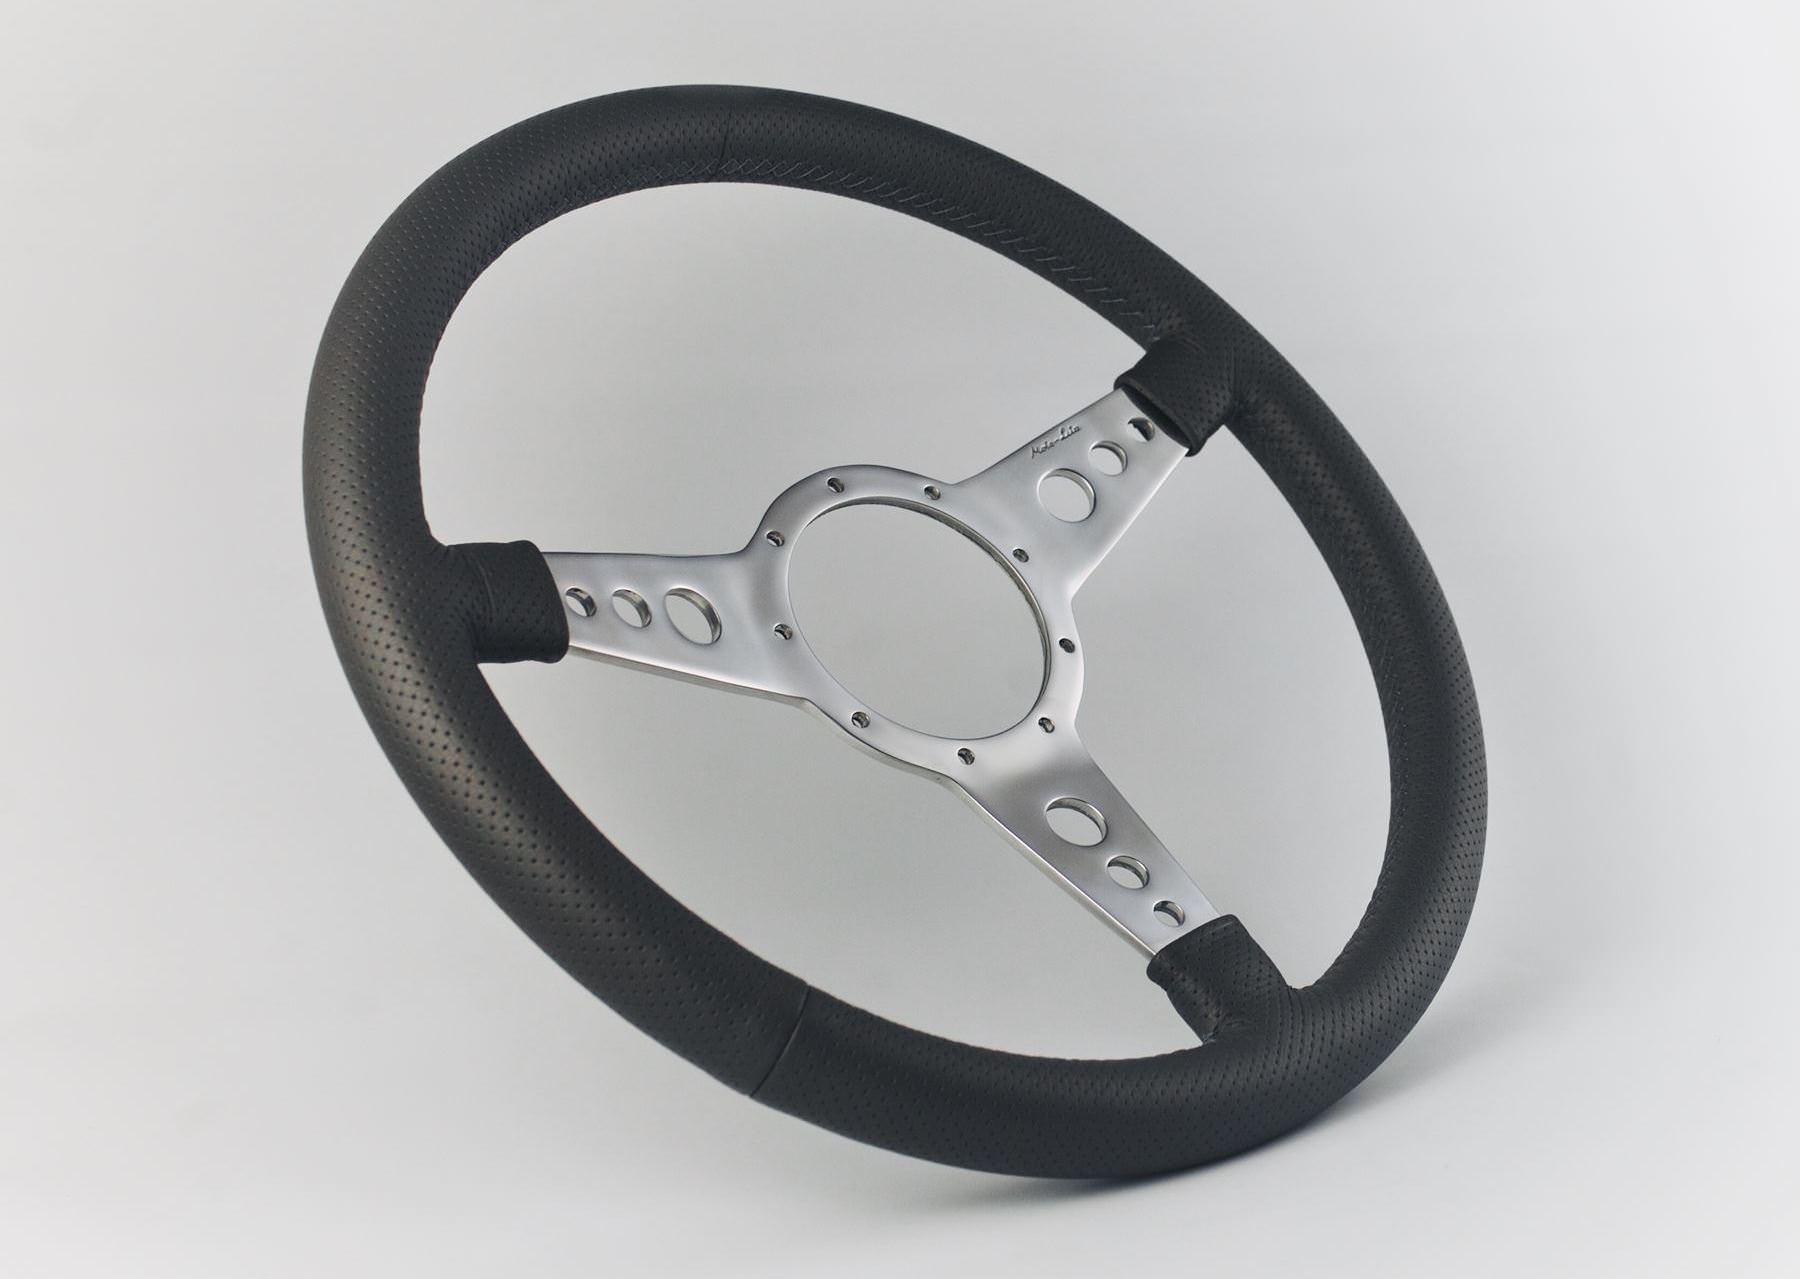 Moto-Lita Mark Four Leather Rim Perforated Steering Wheel